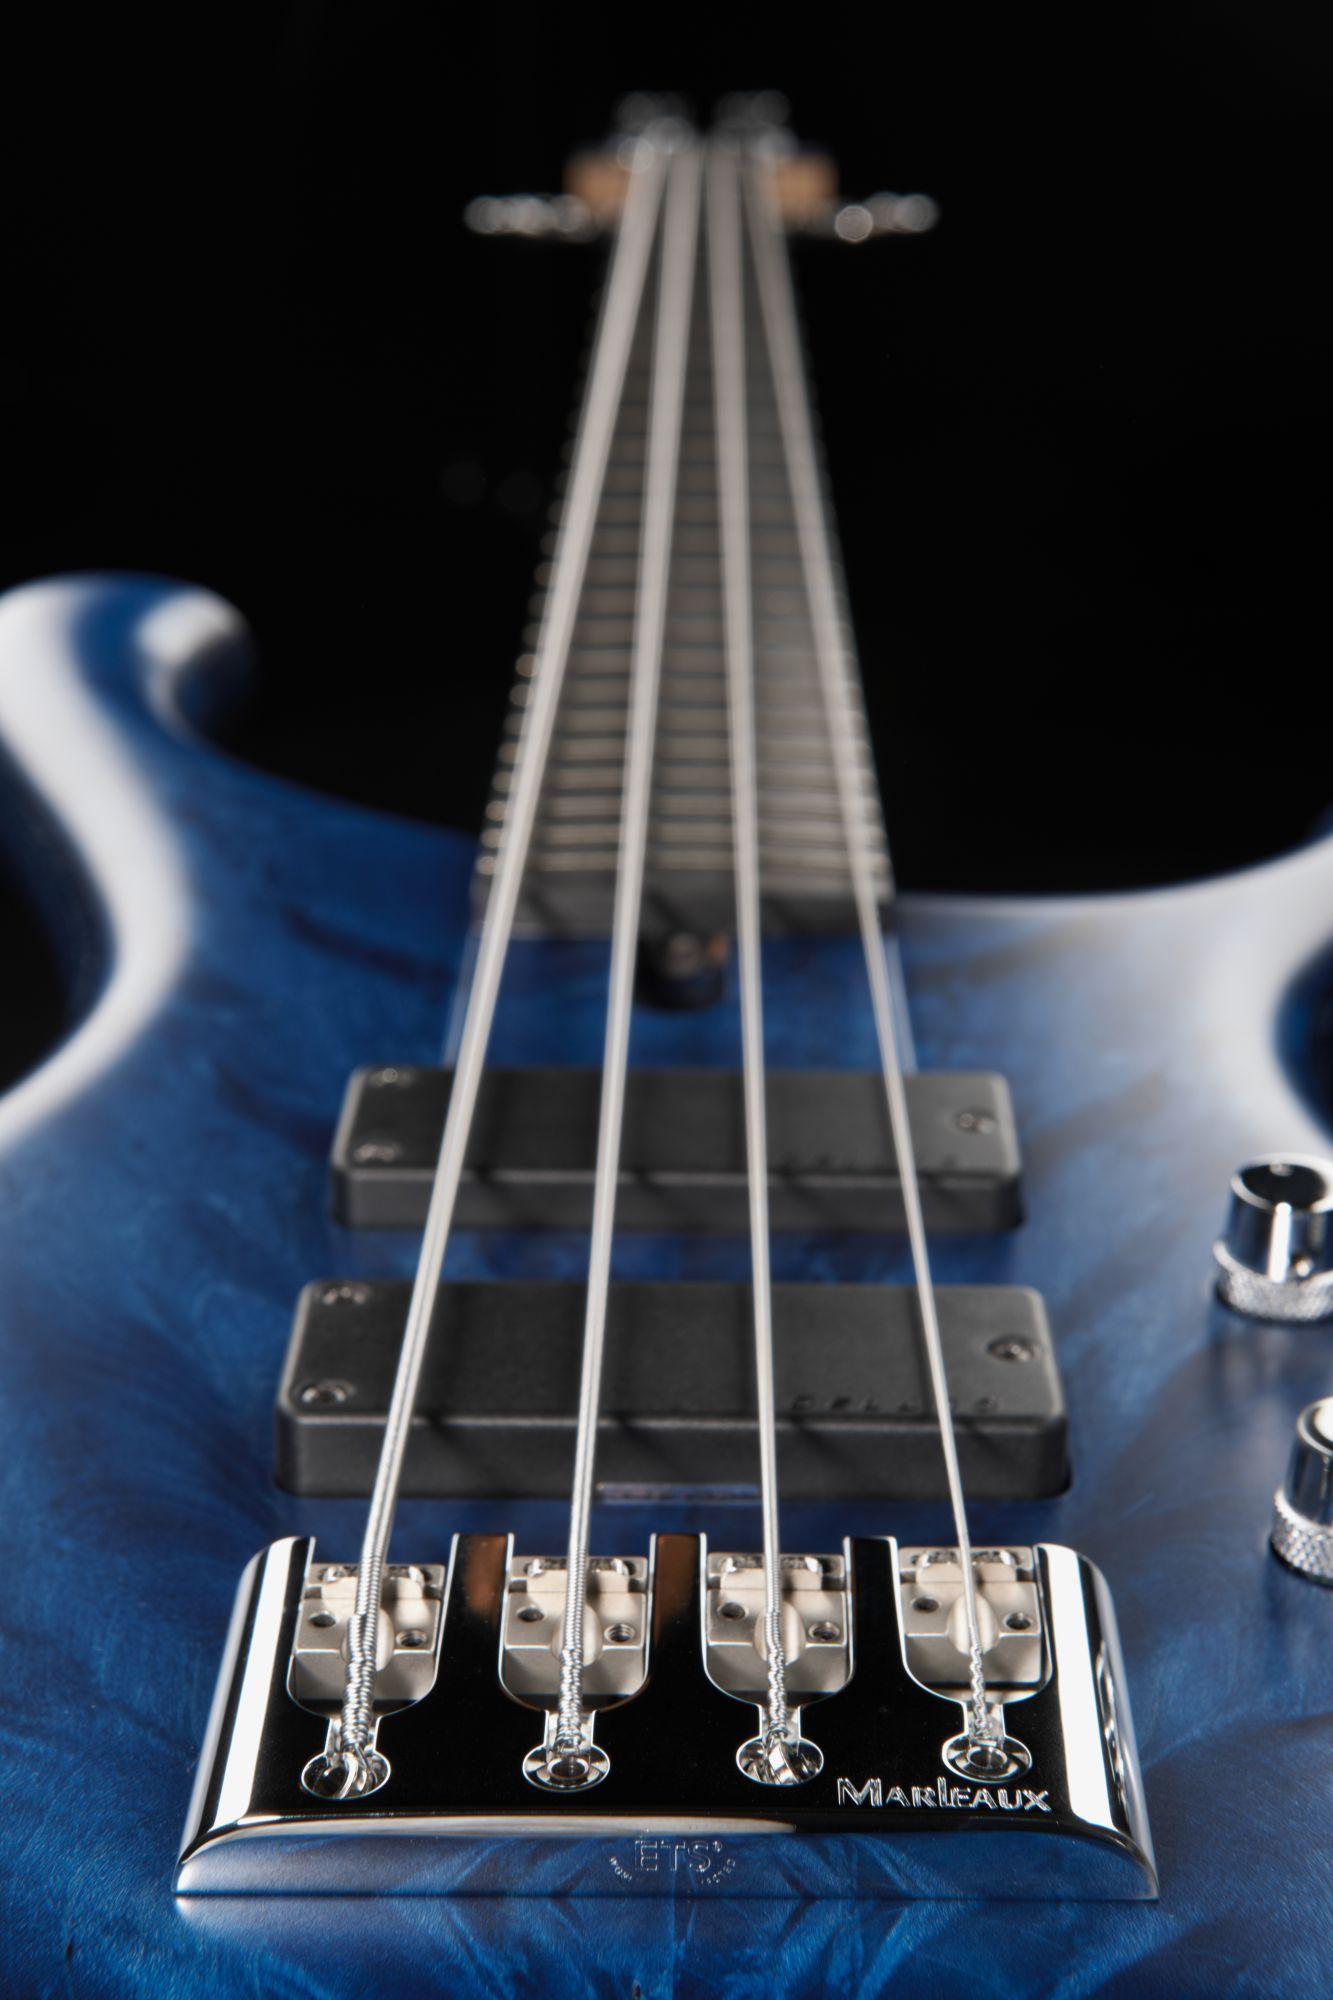 Marleaux Consat Custom 4 Curly Maple TB #marleaux #bass